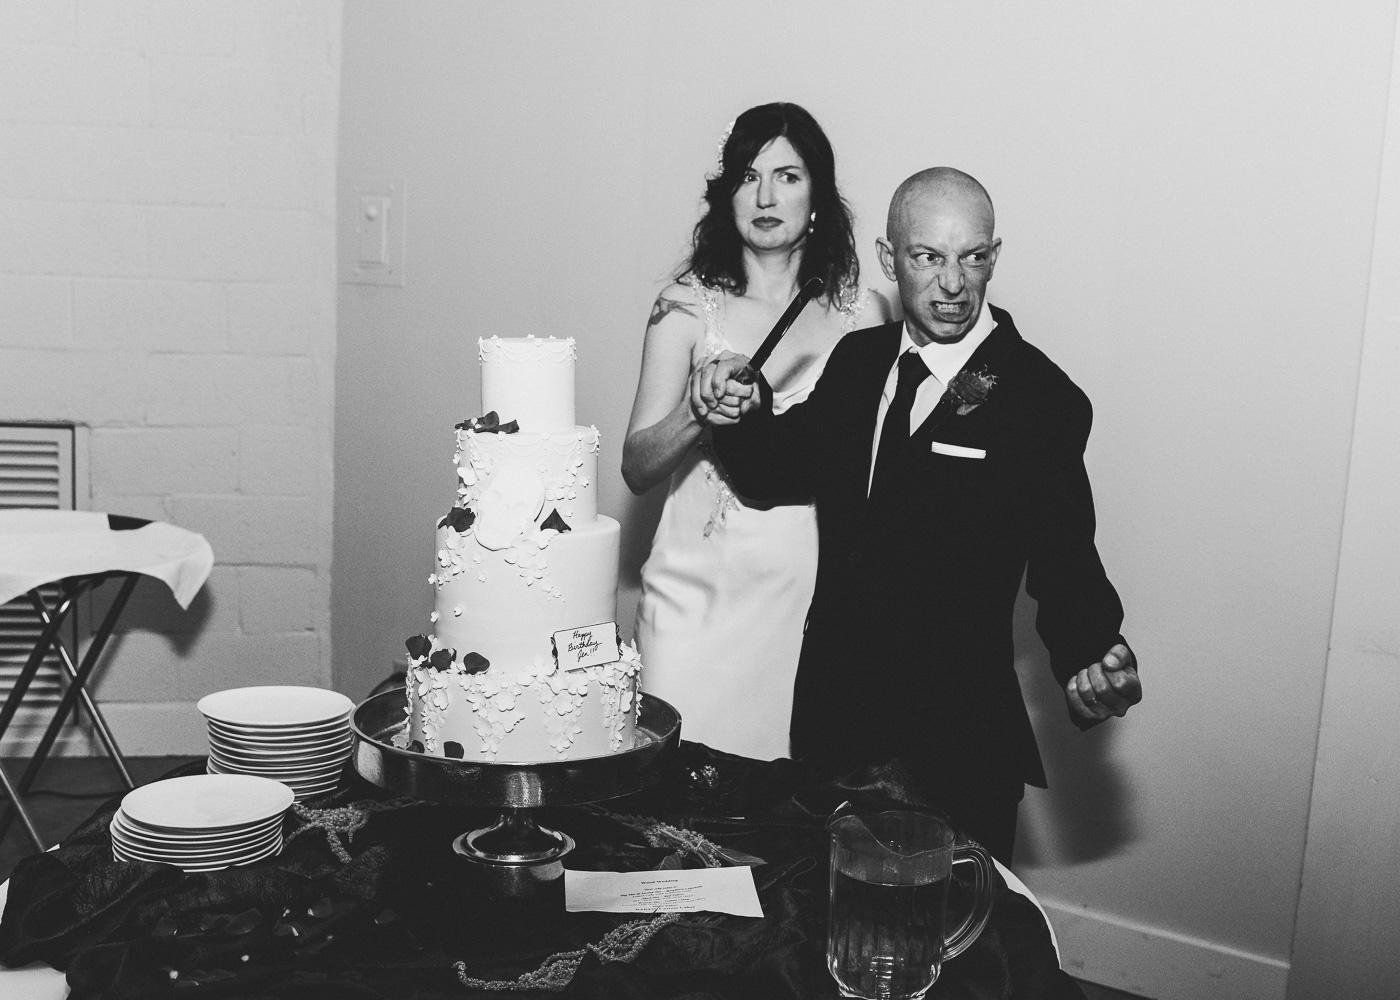 seattleweddingphotographer.jpg